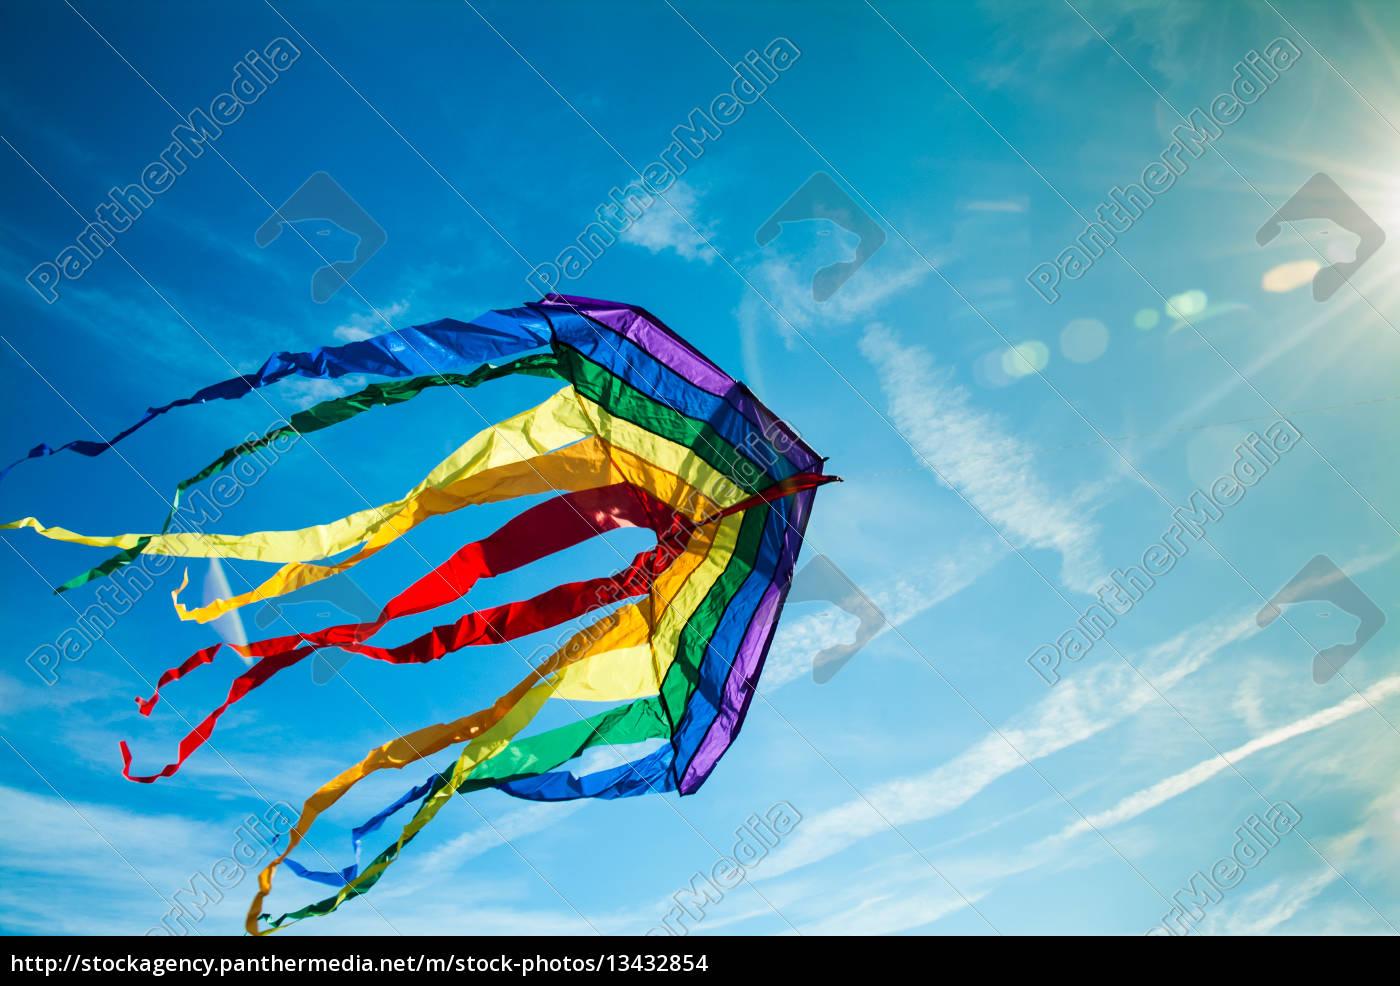 colorful, dragon, flies, in, the, sun - 13432854